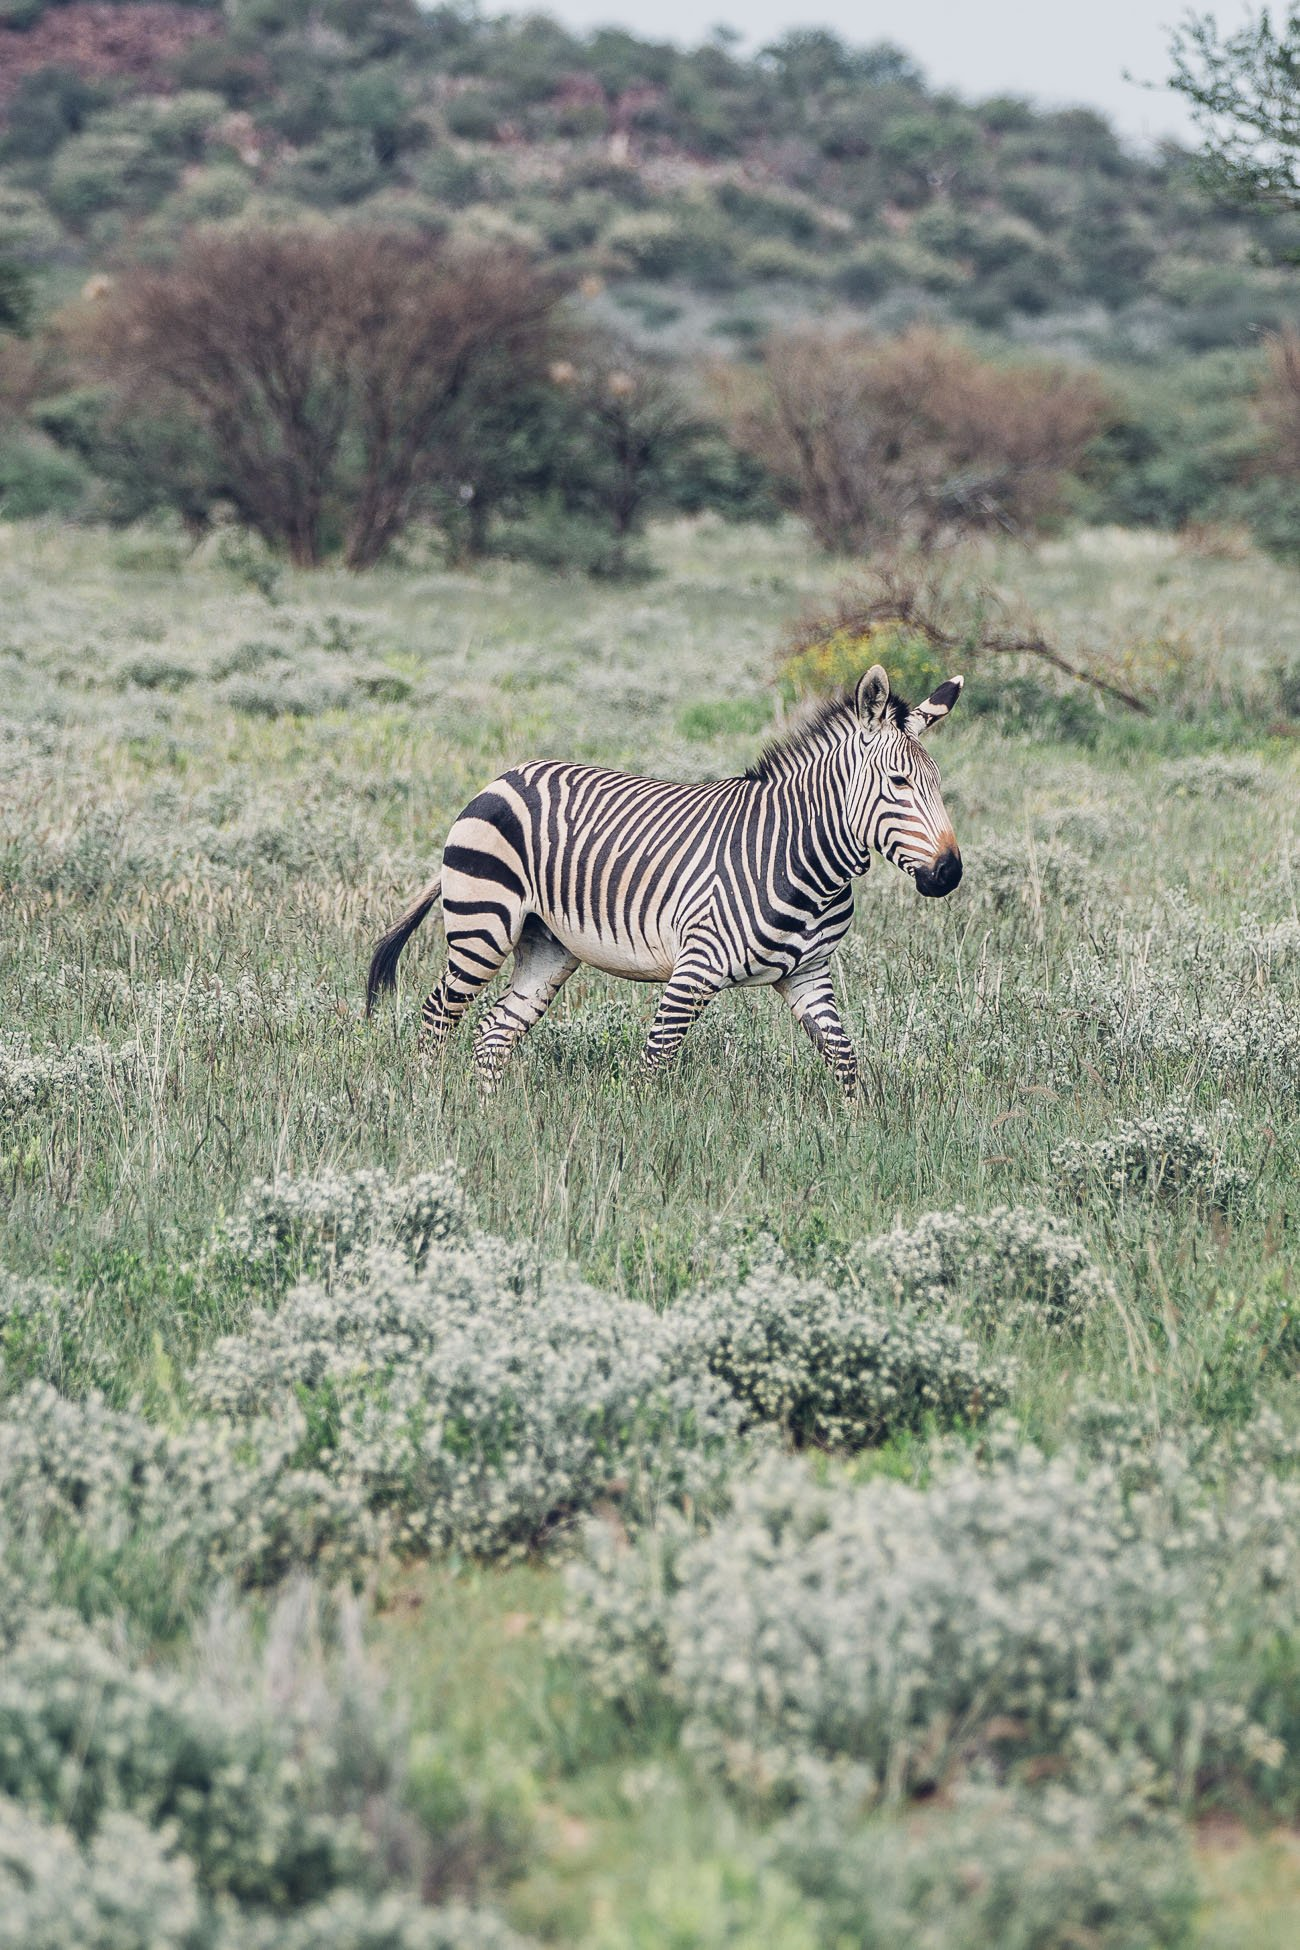 Zebra at a Safari in Namibia